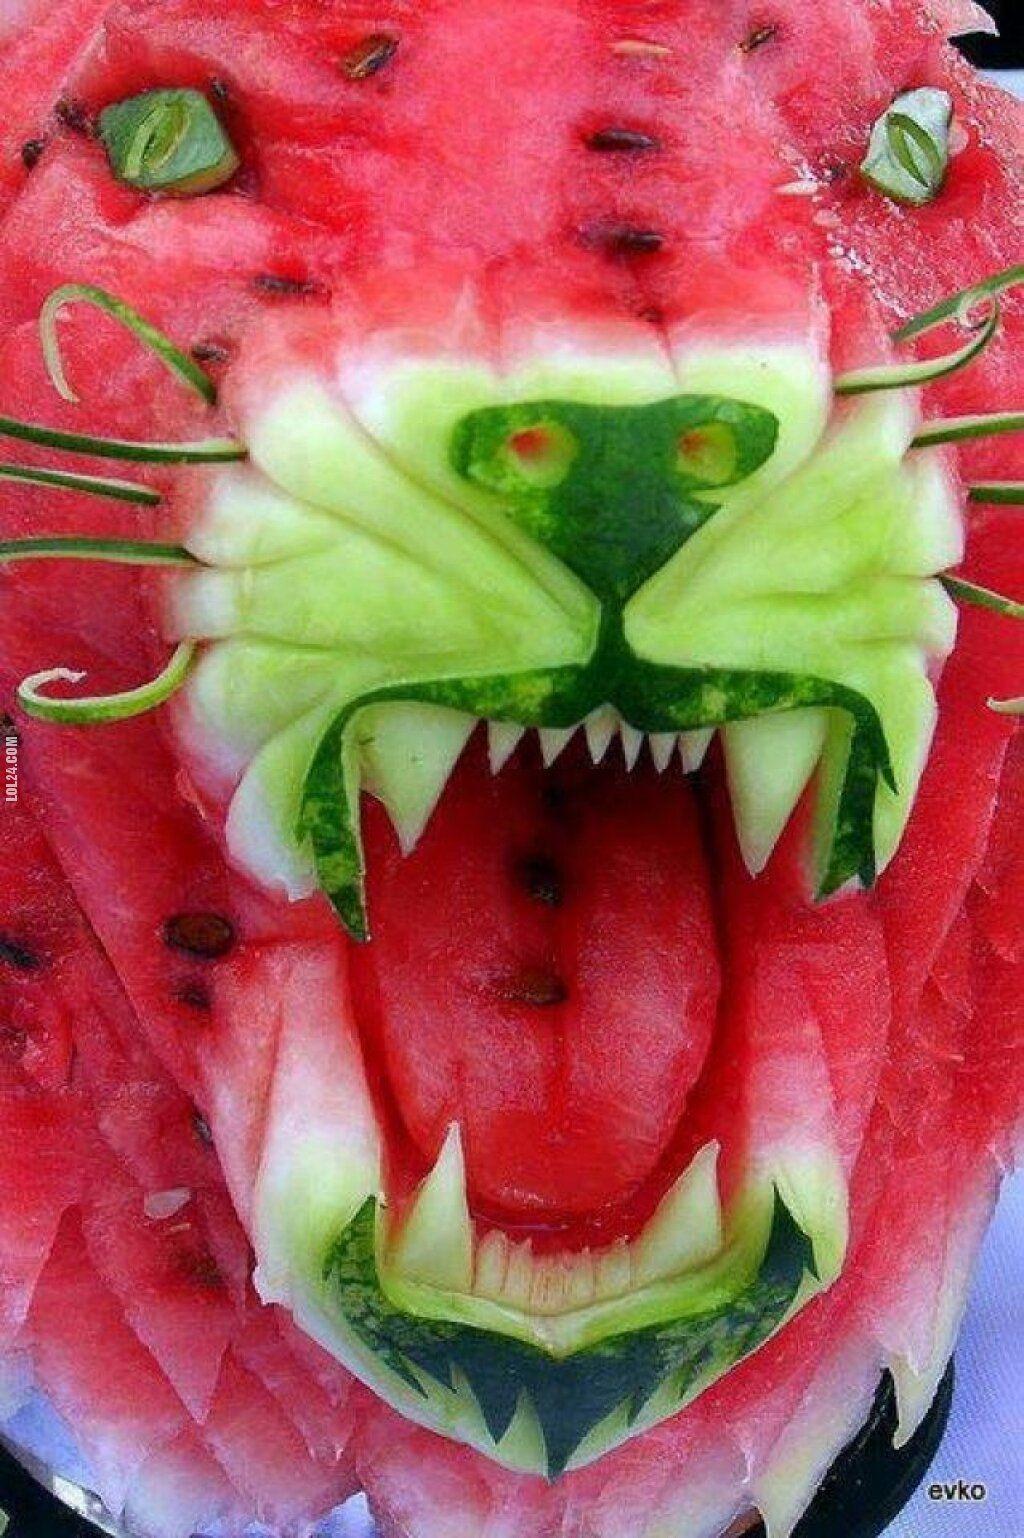 http://src.lol24.com/fotki/large/4/4375_rzezby-figurki-arbuz-lion.jpg